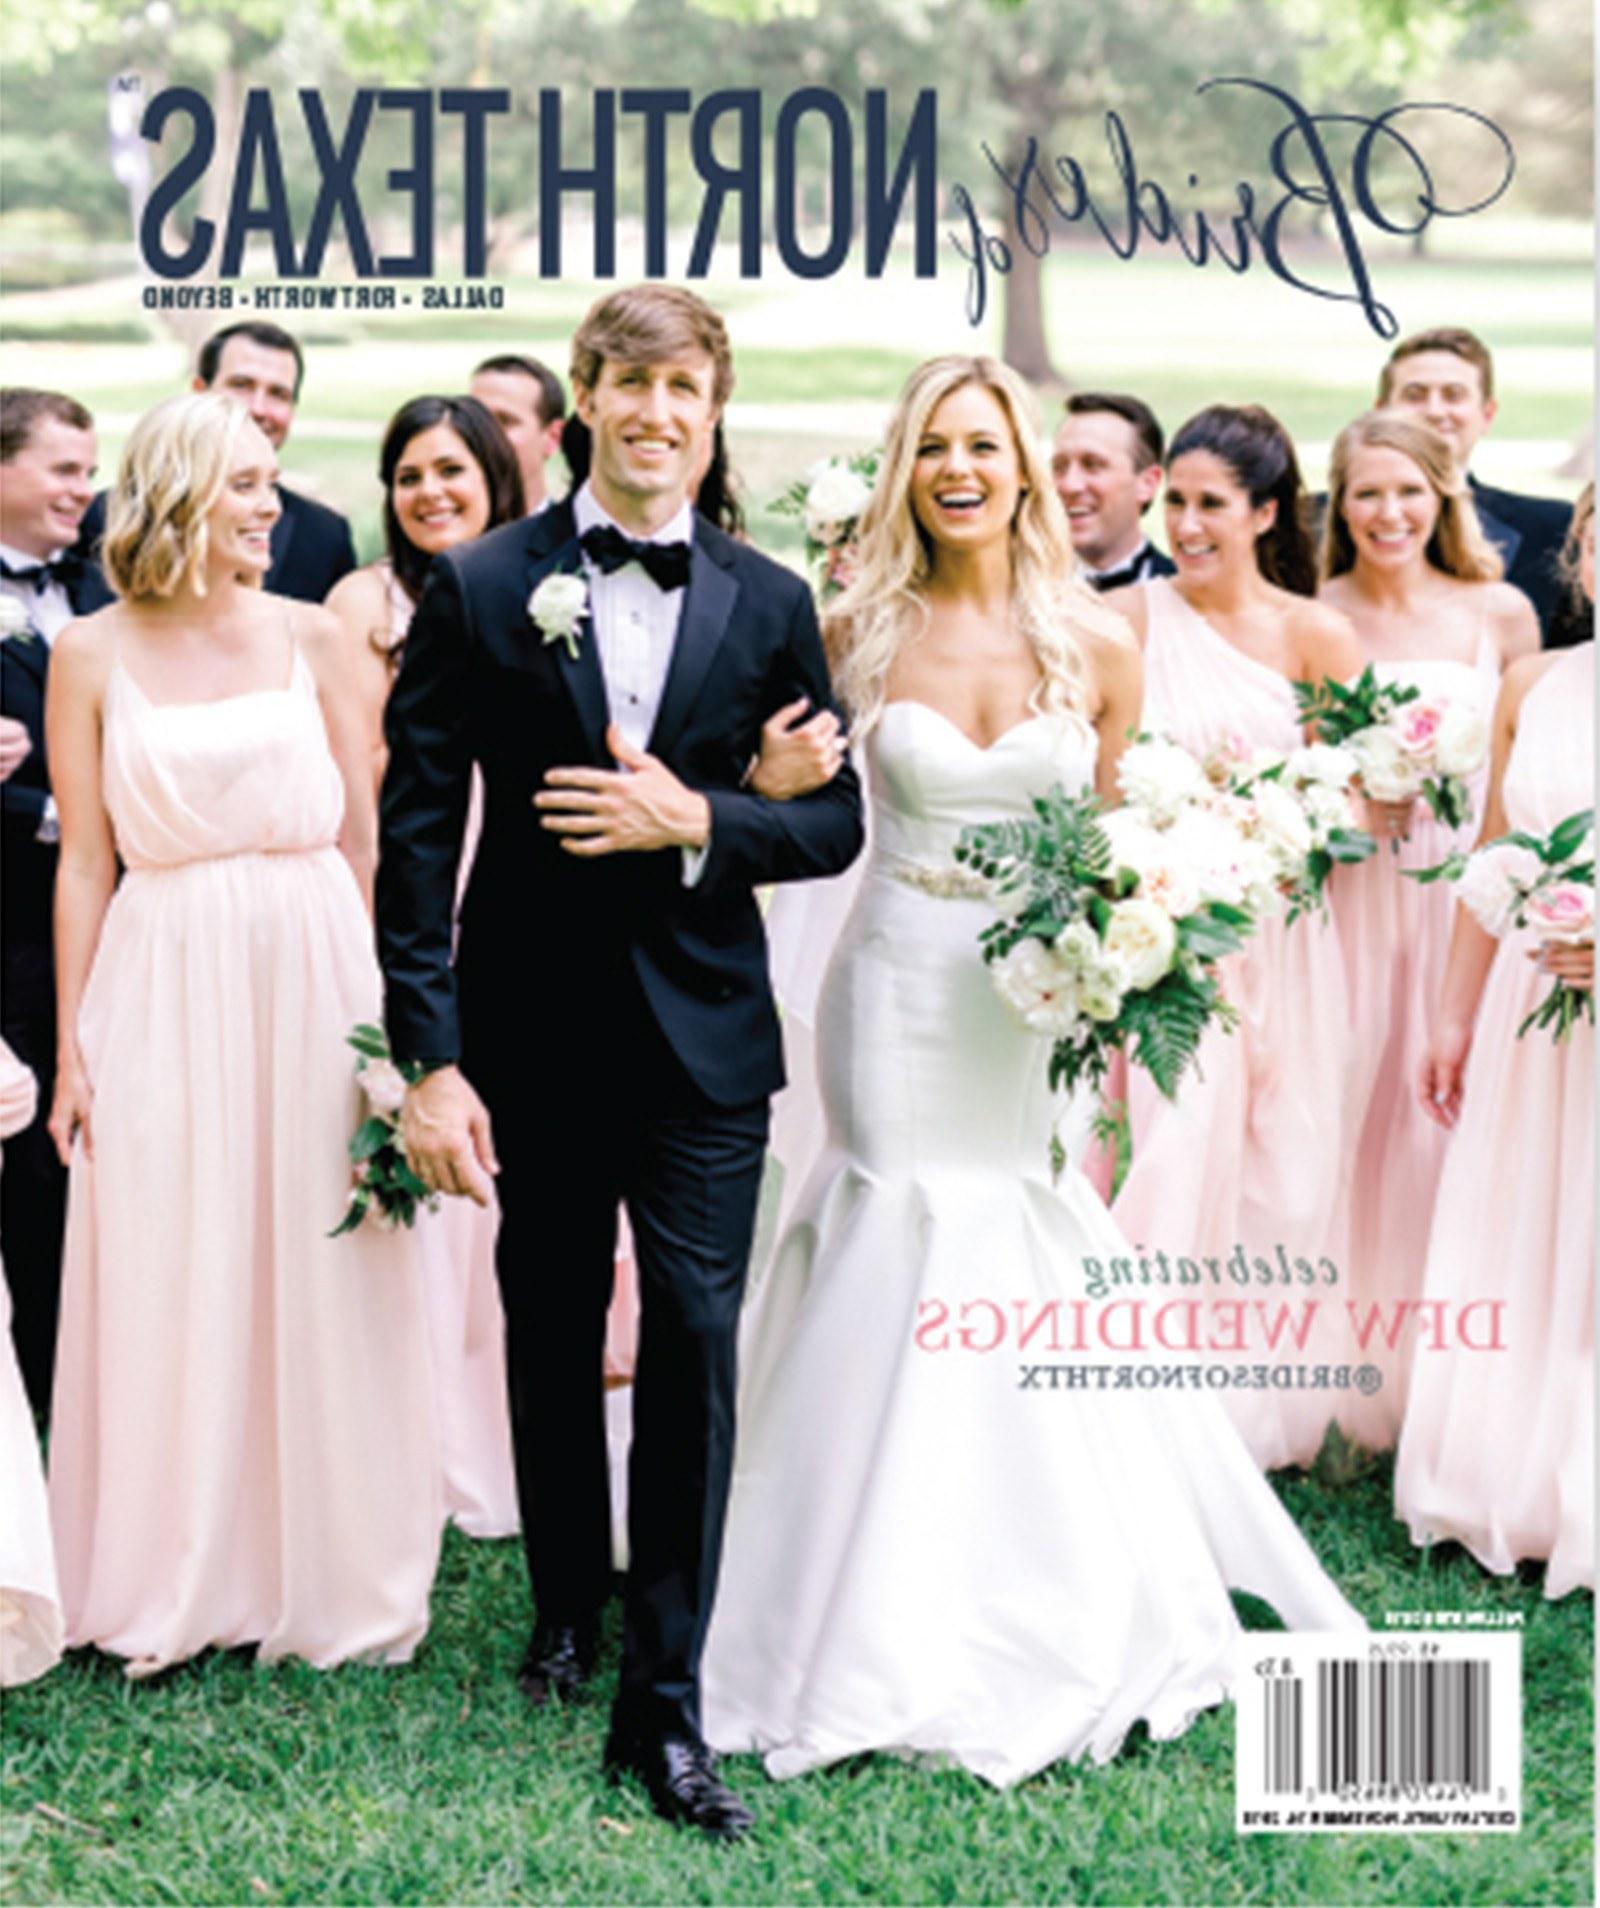 Contoh Gaun Pengantin Muslimah Warna Pink Dwdk Real Weddings Featured In Brides Of north Texas